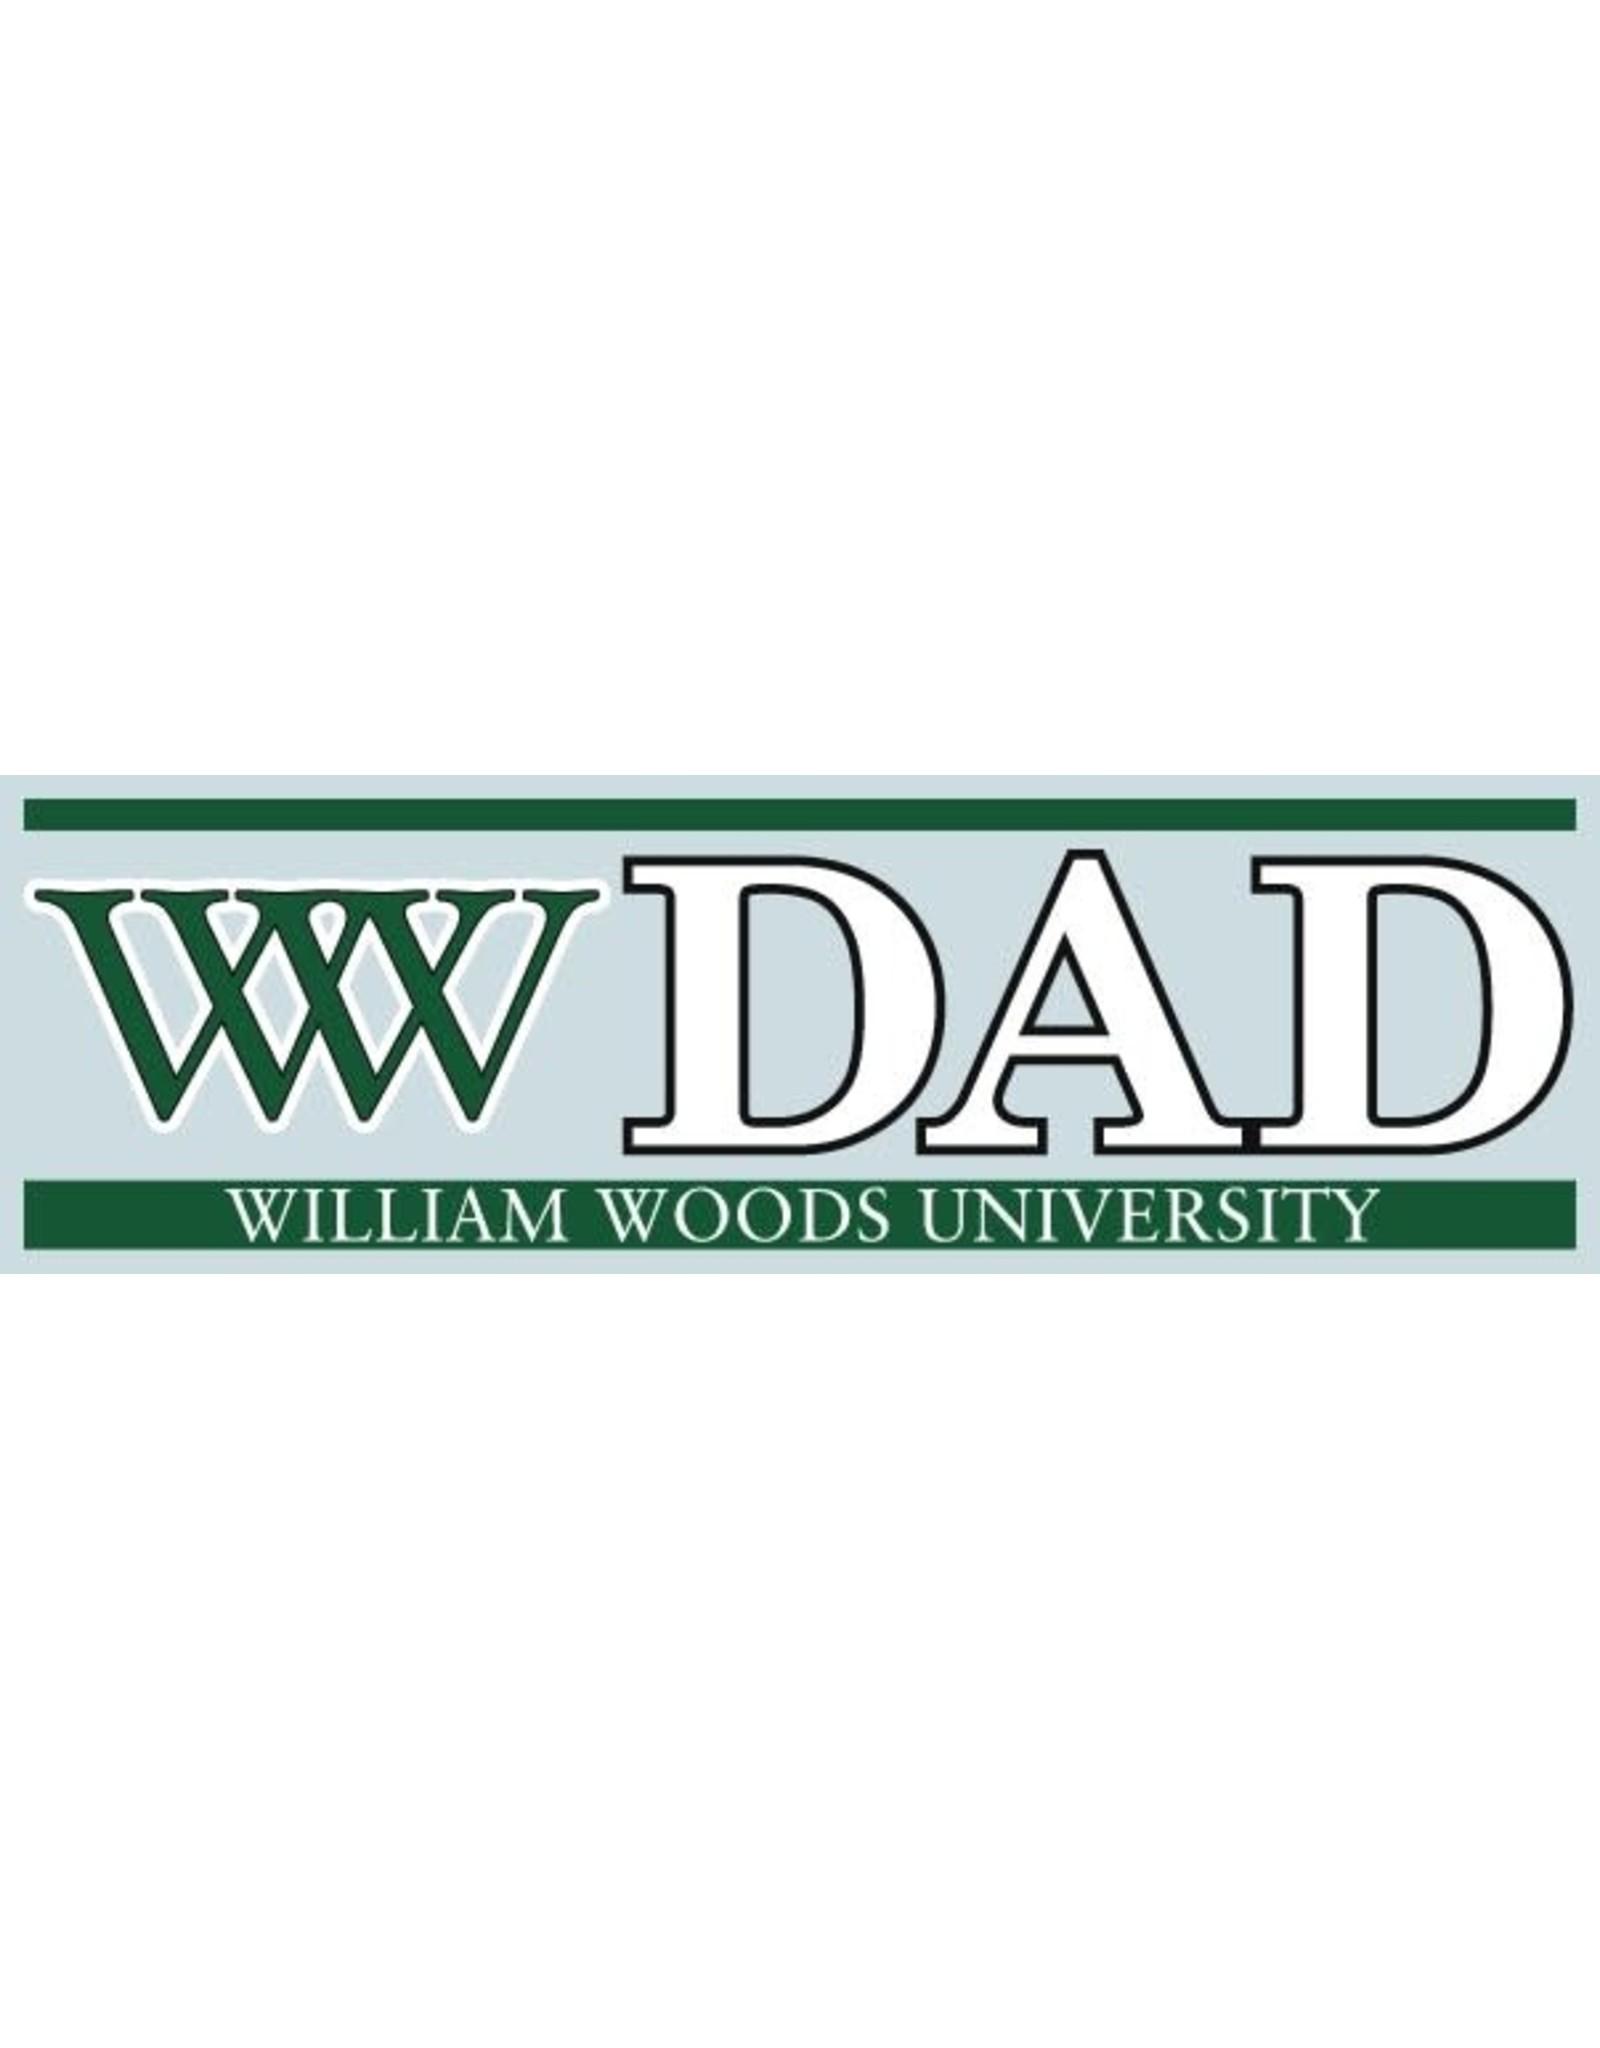 Decal WW DAD